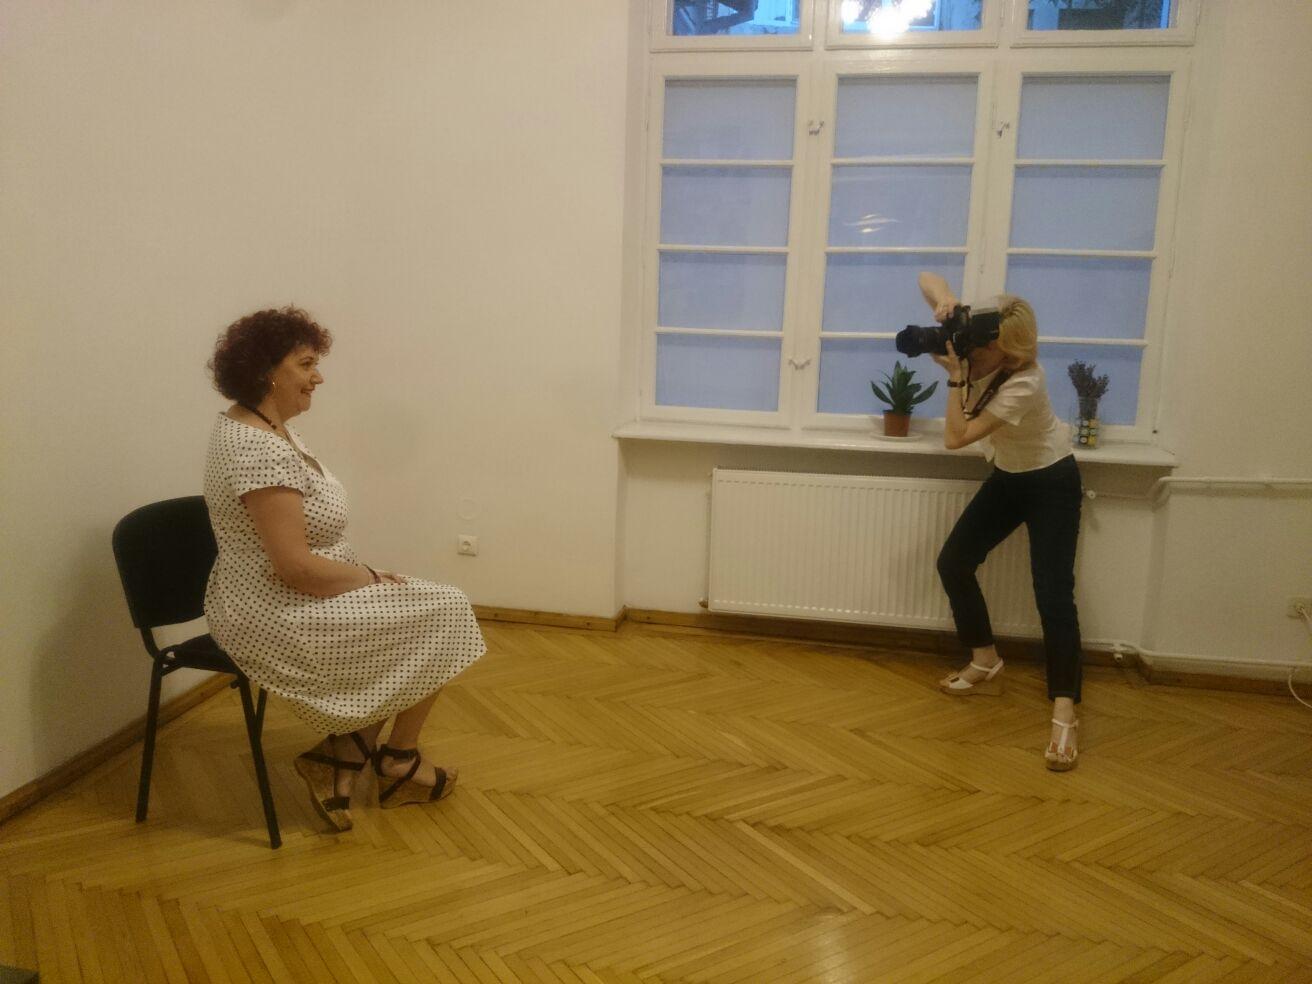 Butic de idei - Amalia Savinescu